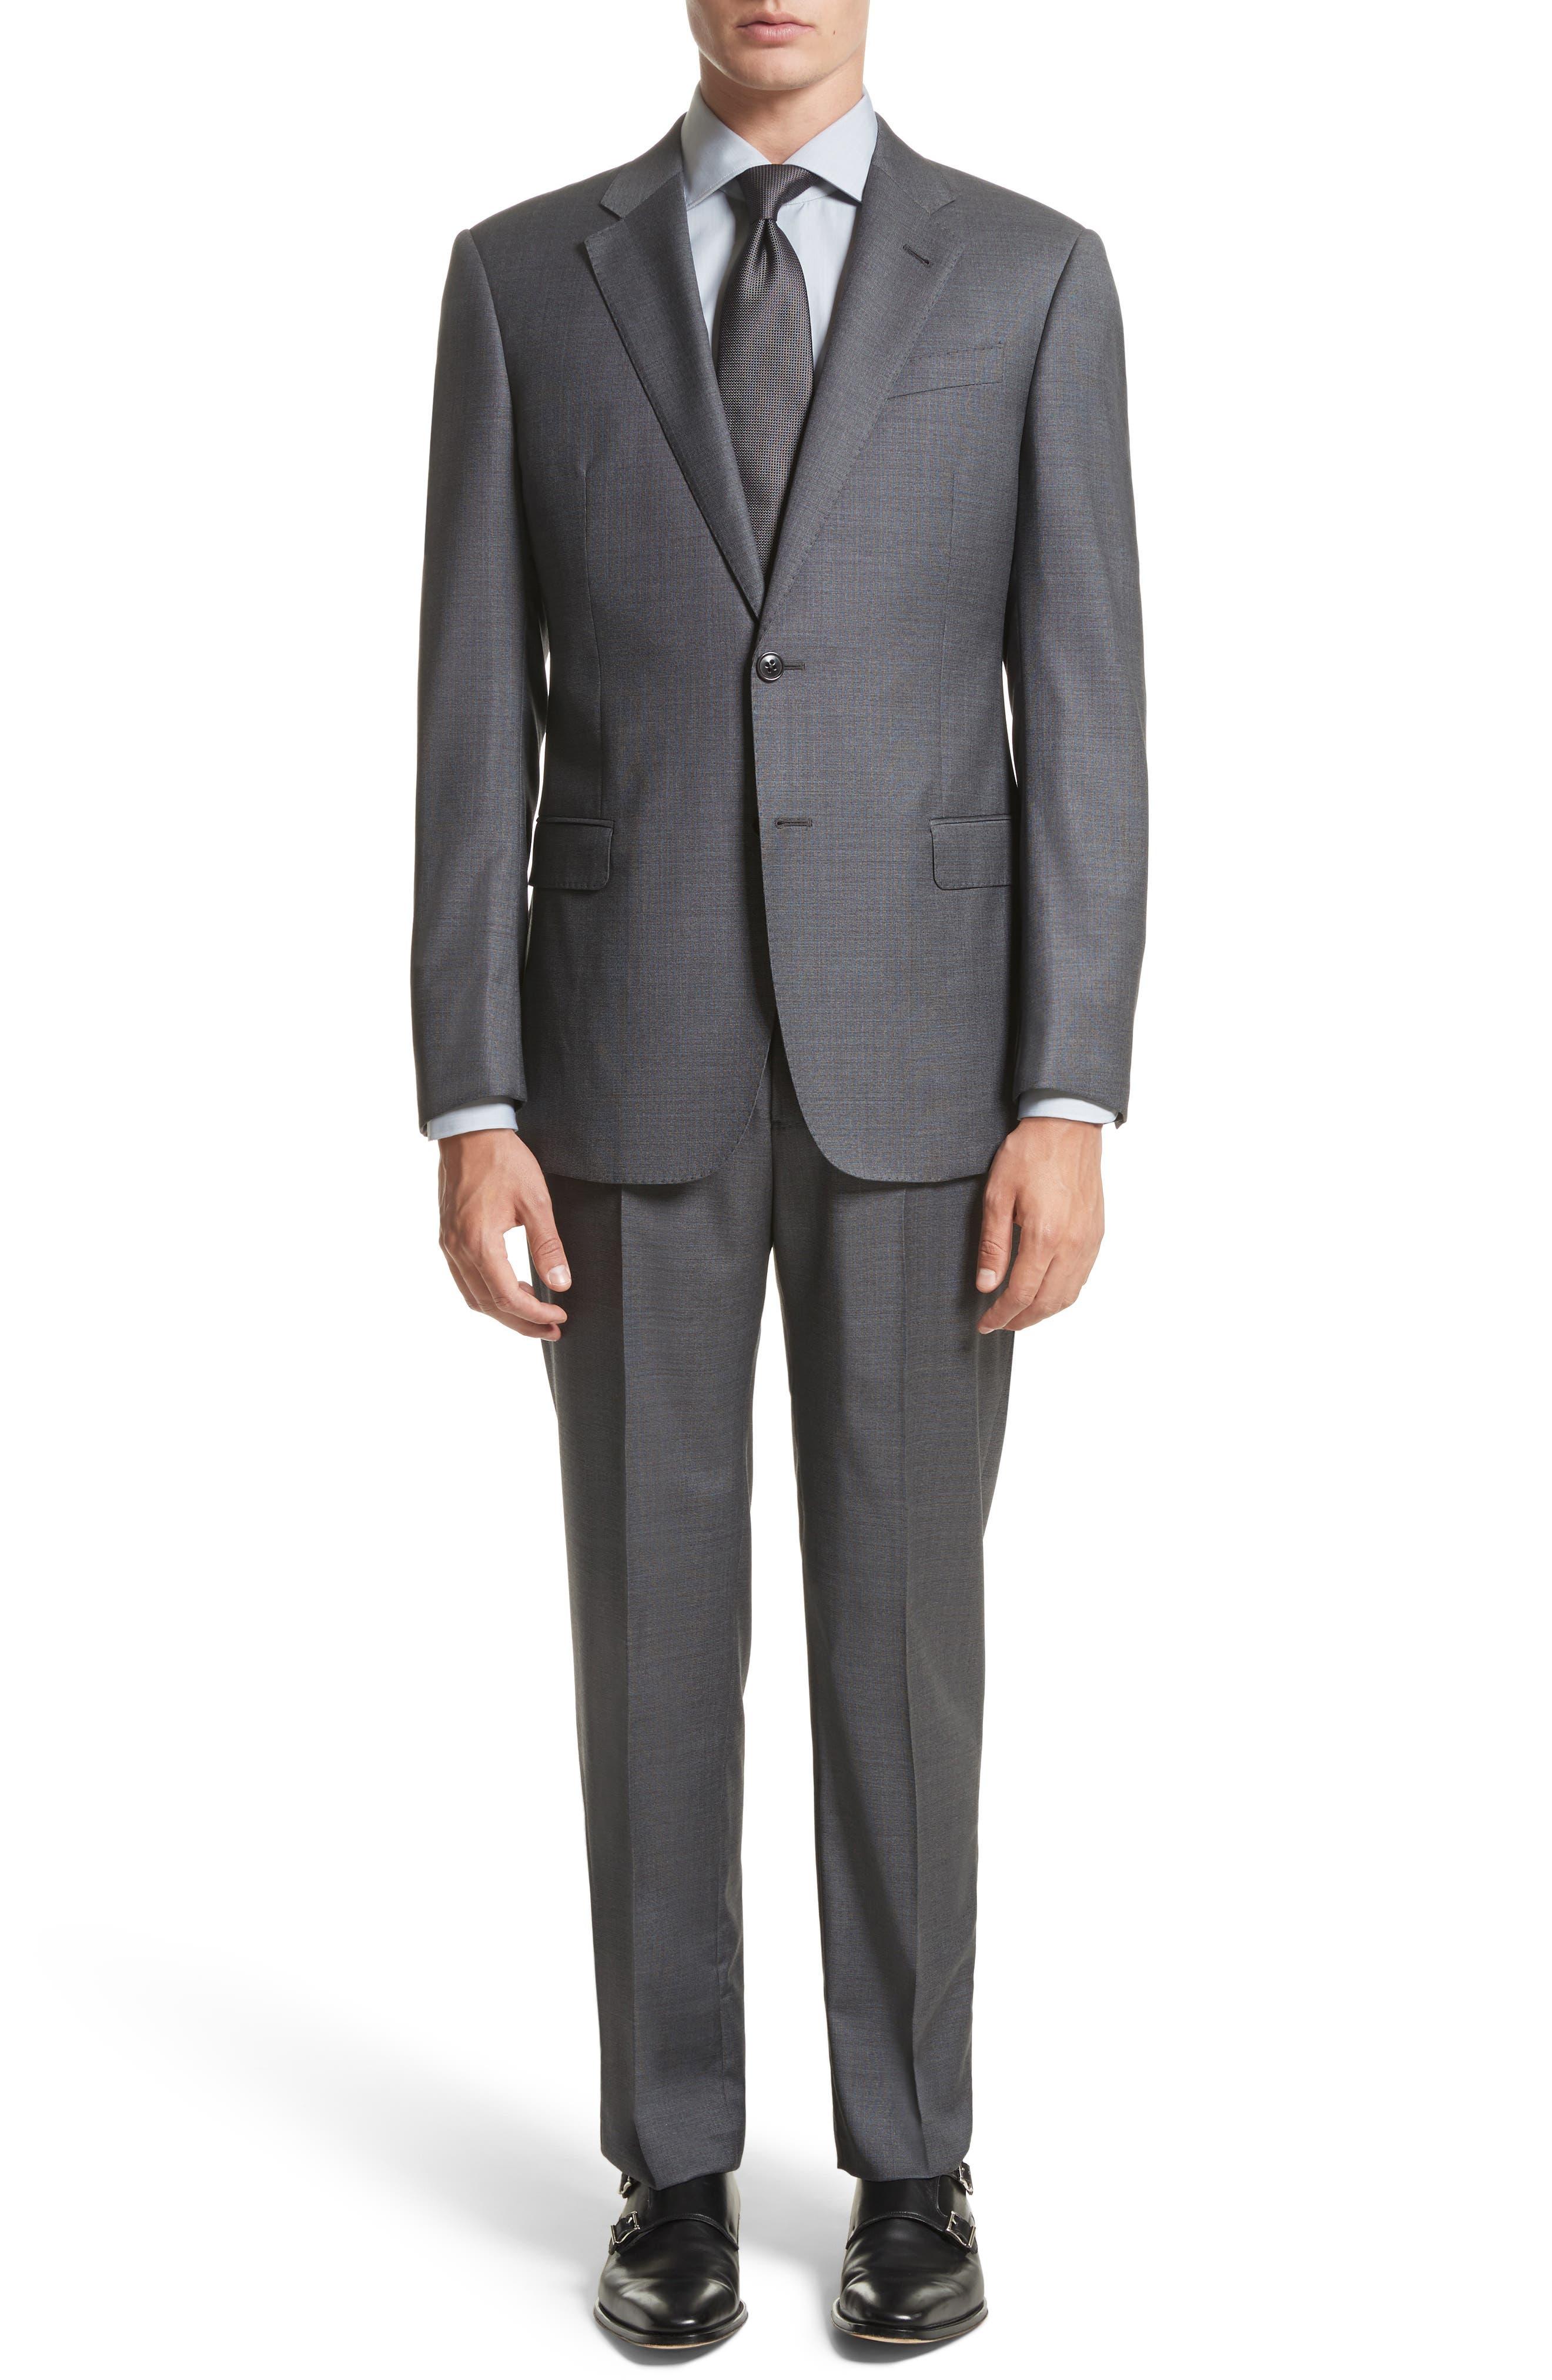 Alternate Image 1 Selected - Armani Collezioni G-Line Trim Fit Solid Wool Suit